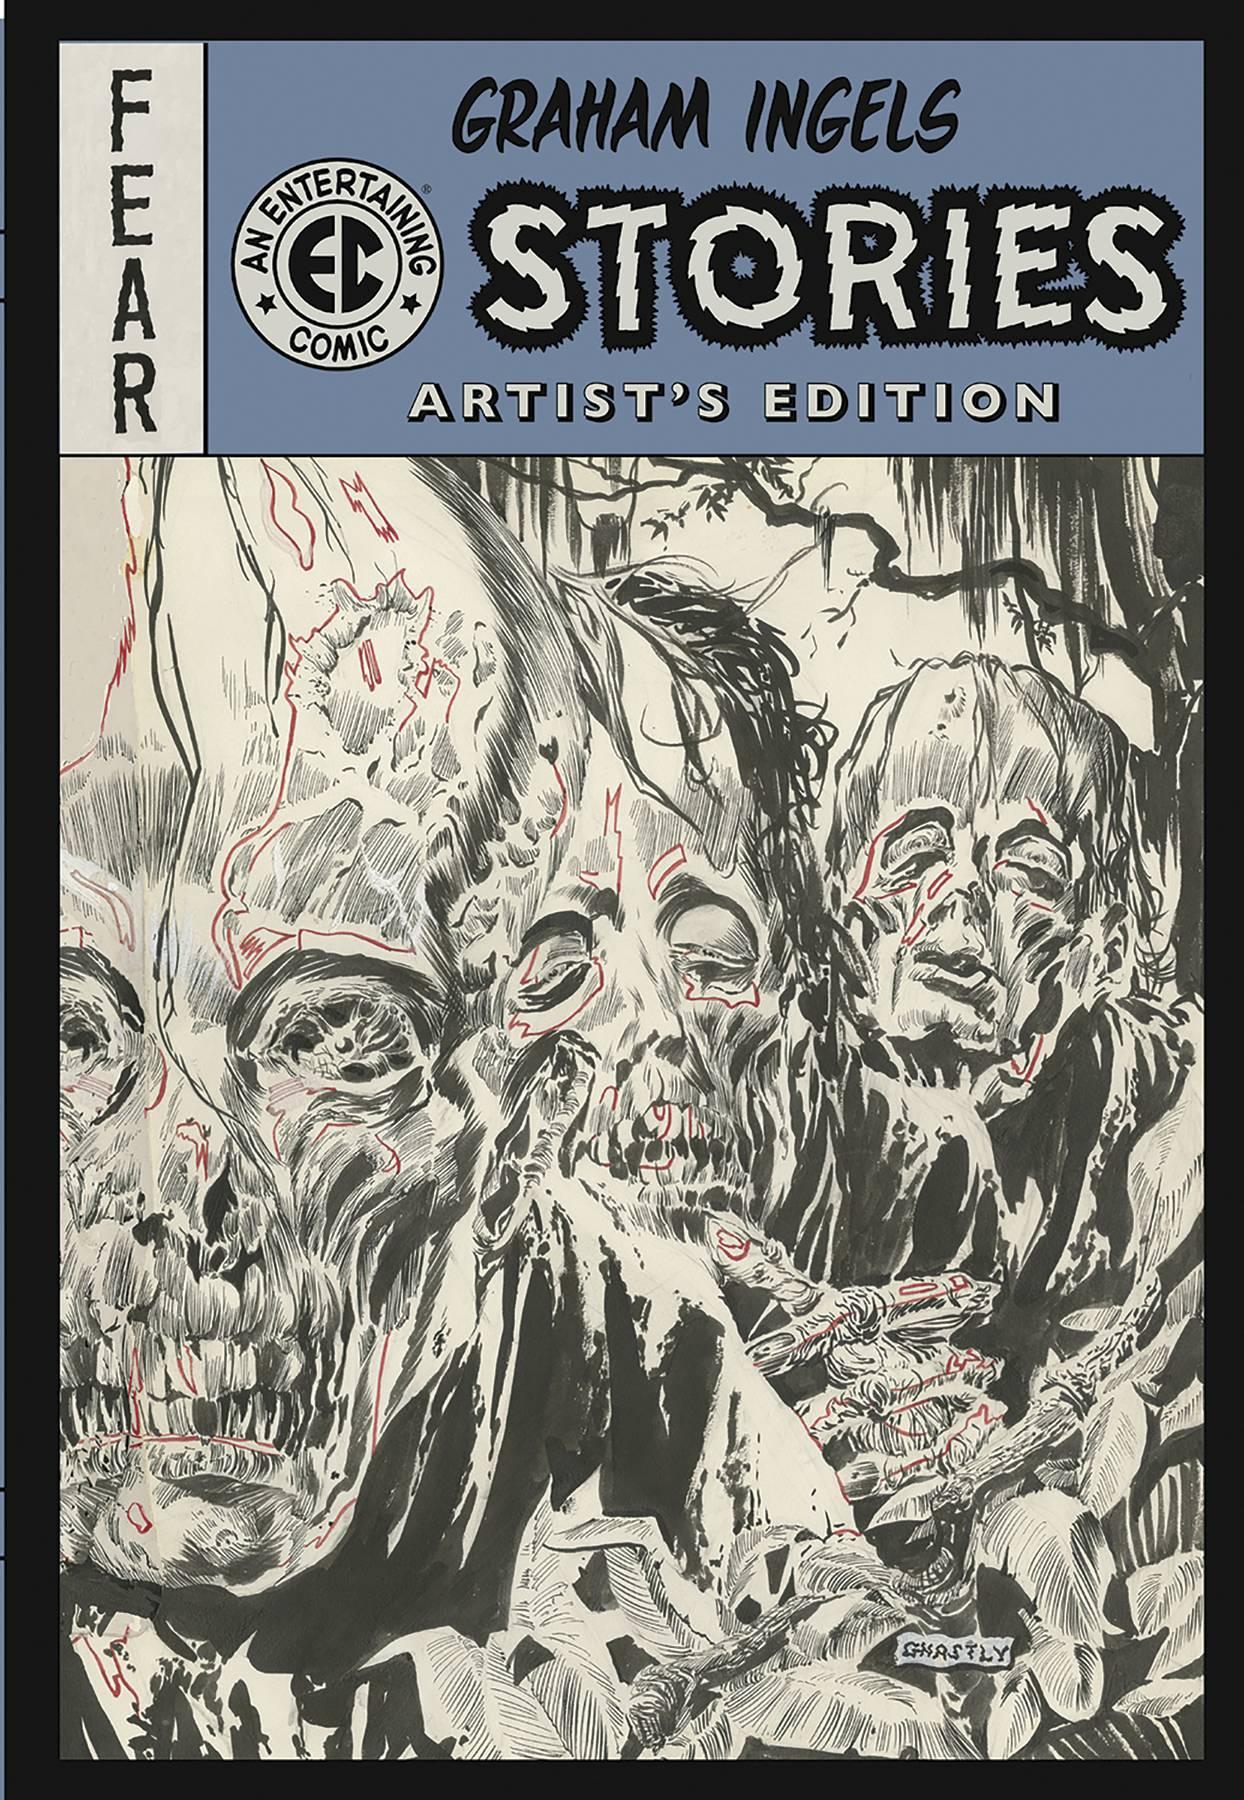 Review | Graham Ingels' EC Stories Artist's Edition